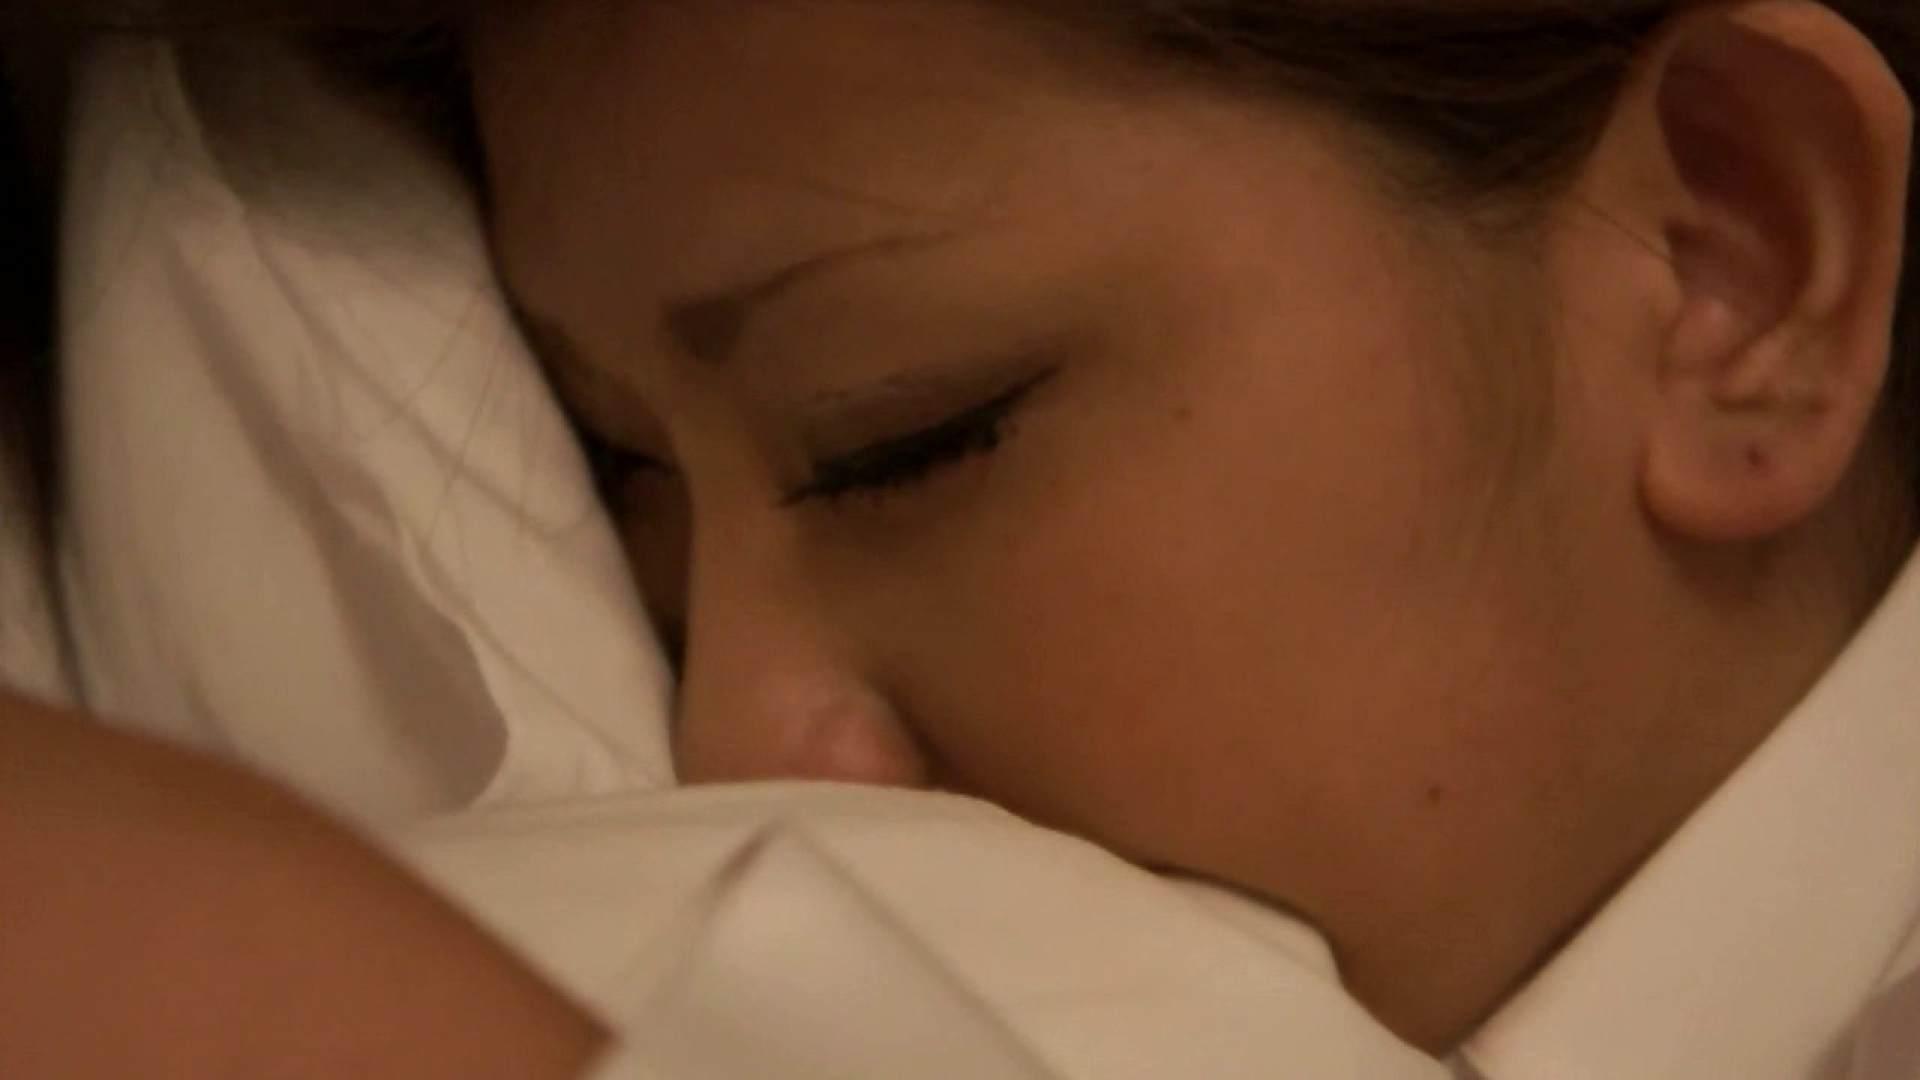 vol.8 【Mちゃん(2回目)】ブランド品査定士19歳 花子とも仲良し イタズラ特集 | ギャル盗撮映像  89PIX